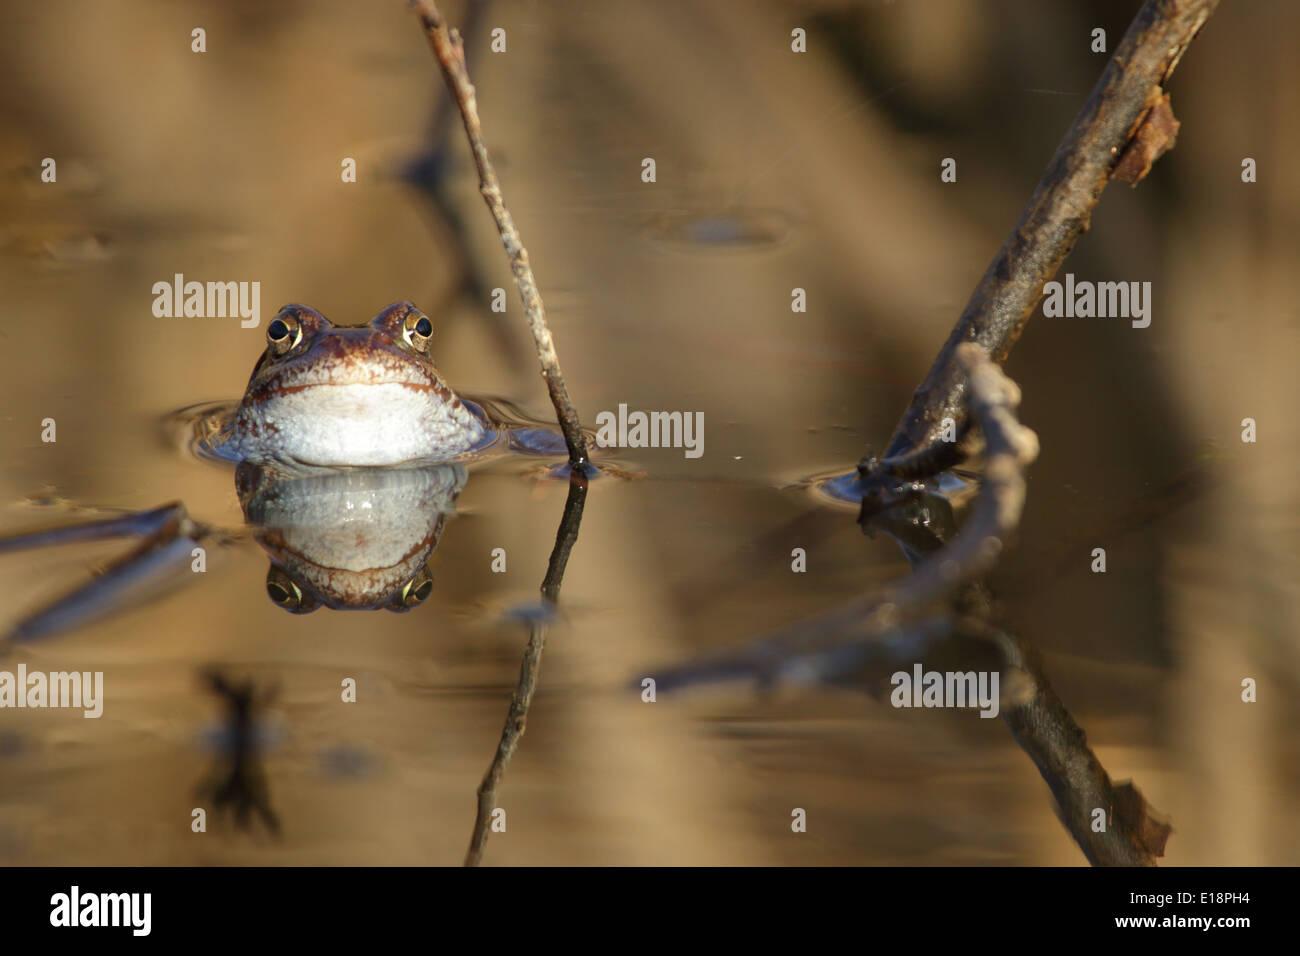 Common frog (Rana temporaria) in spring. - Stock Image